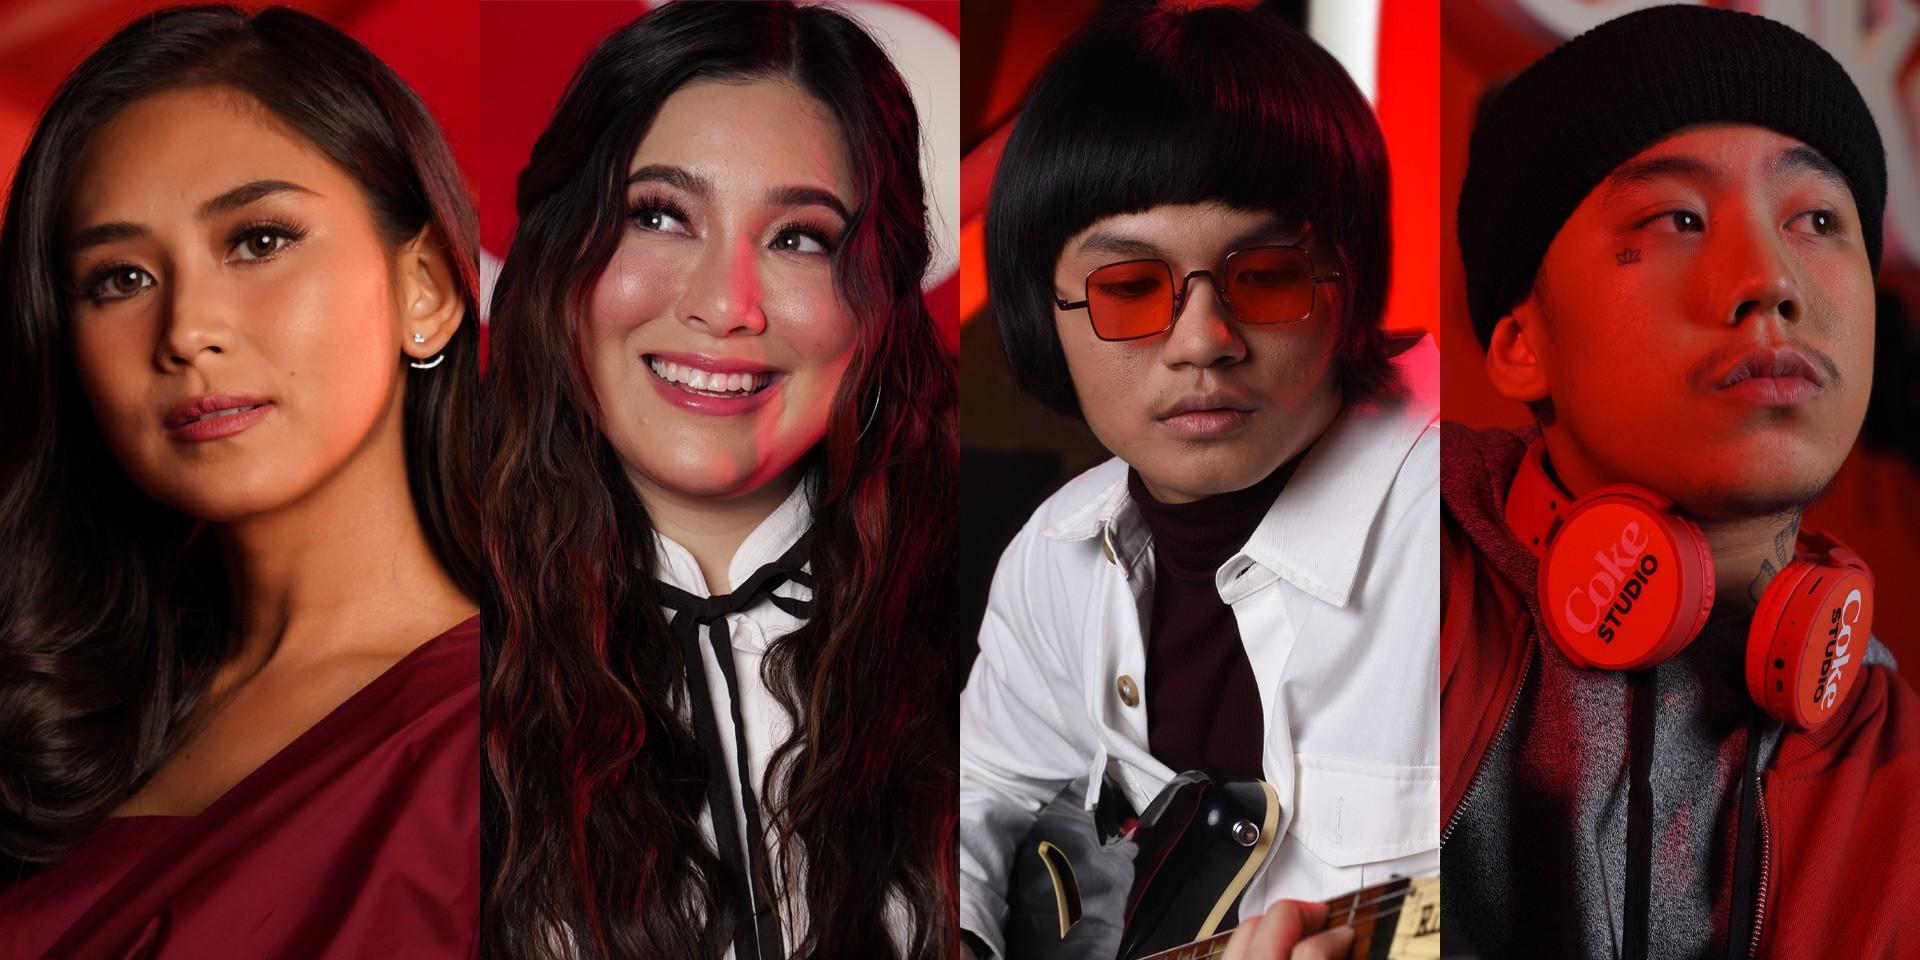 Sarah Geronimo, Moira Dela Torre, Unique Salonga, Shanti Dope, and more return for this season's Coke Studio Philippines